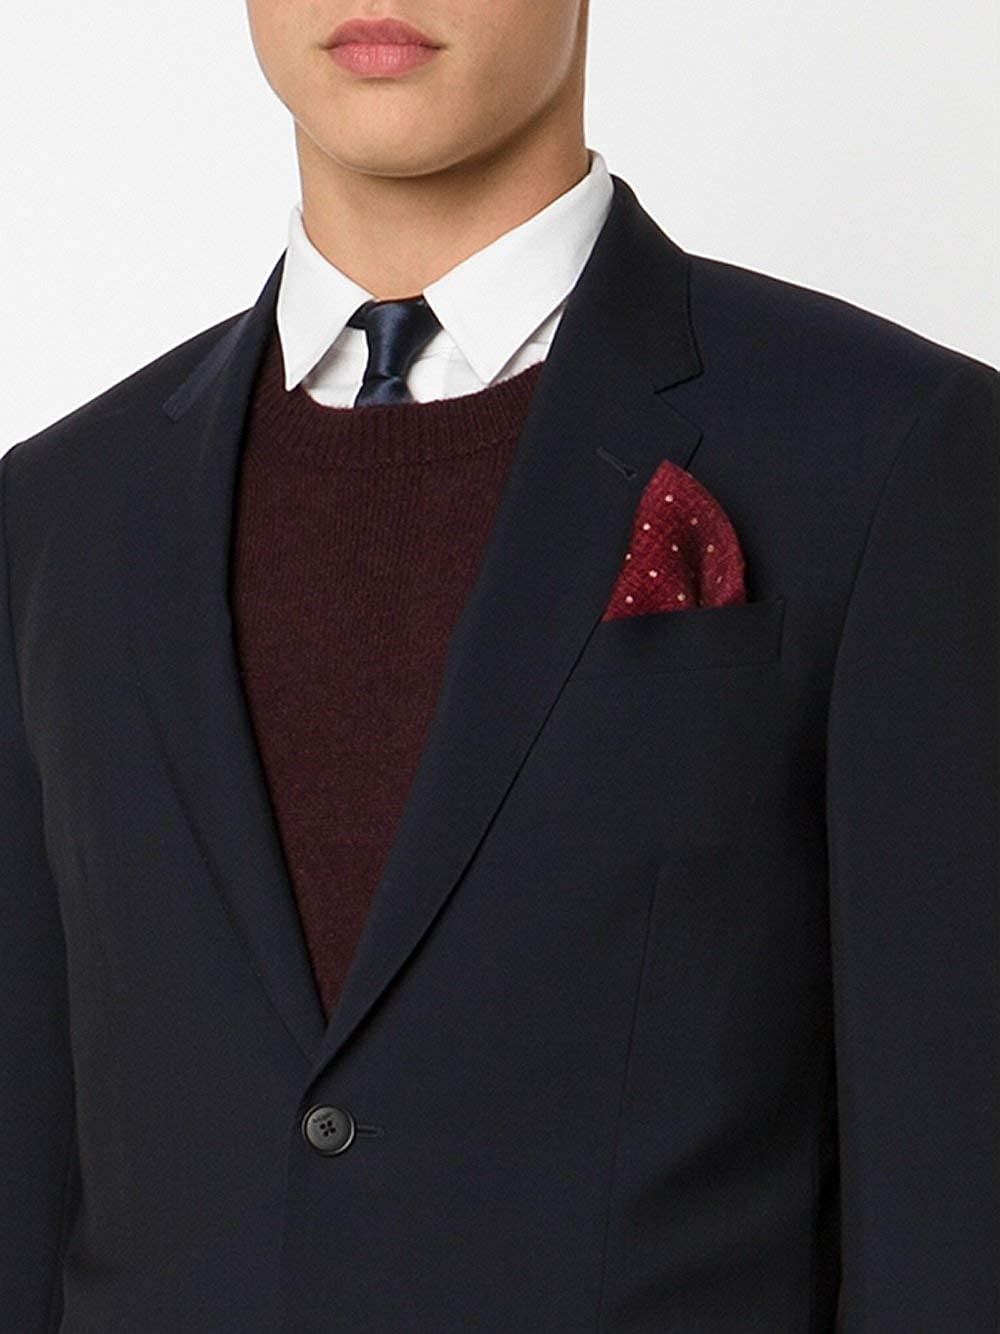 Brunello Cucinelli Red Mixed Print Polka Dot Handkerchief//Pocket Square